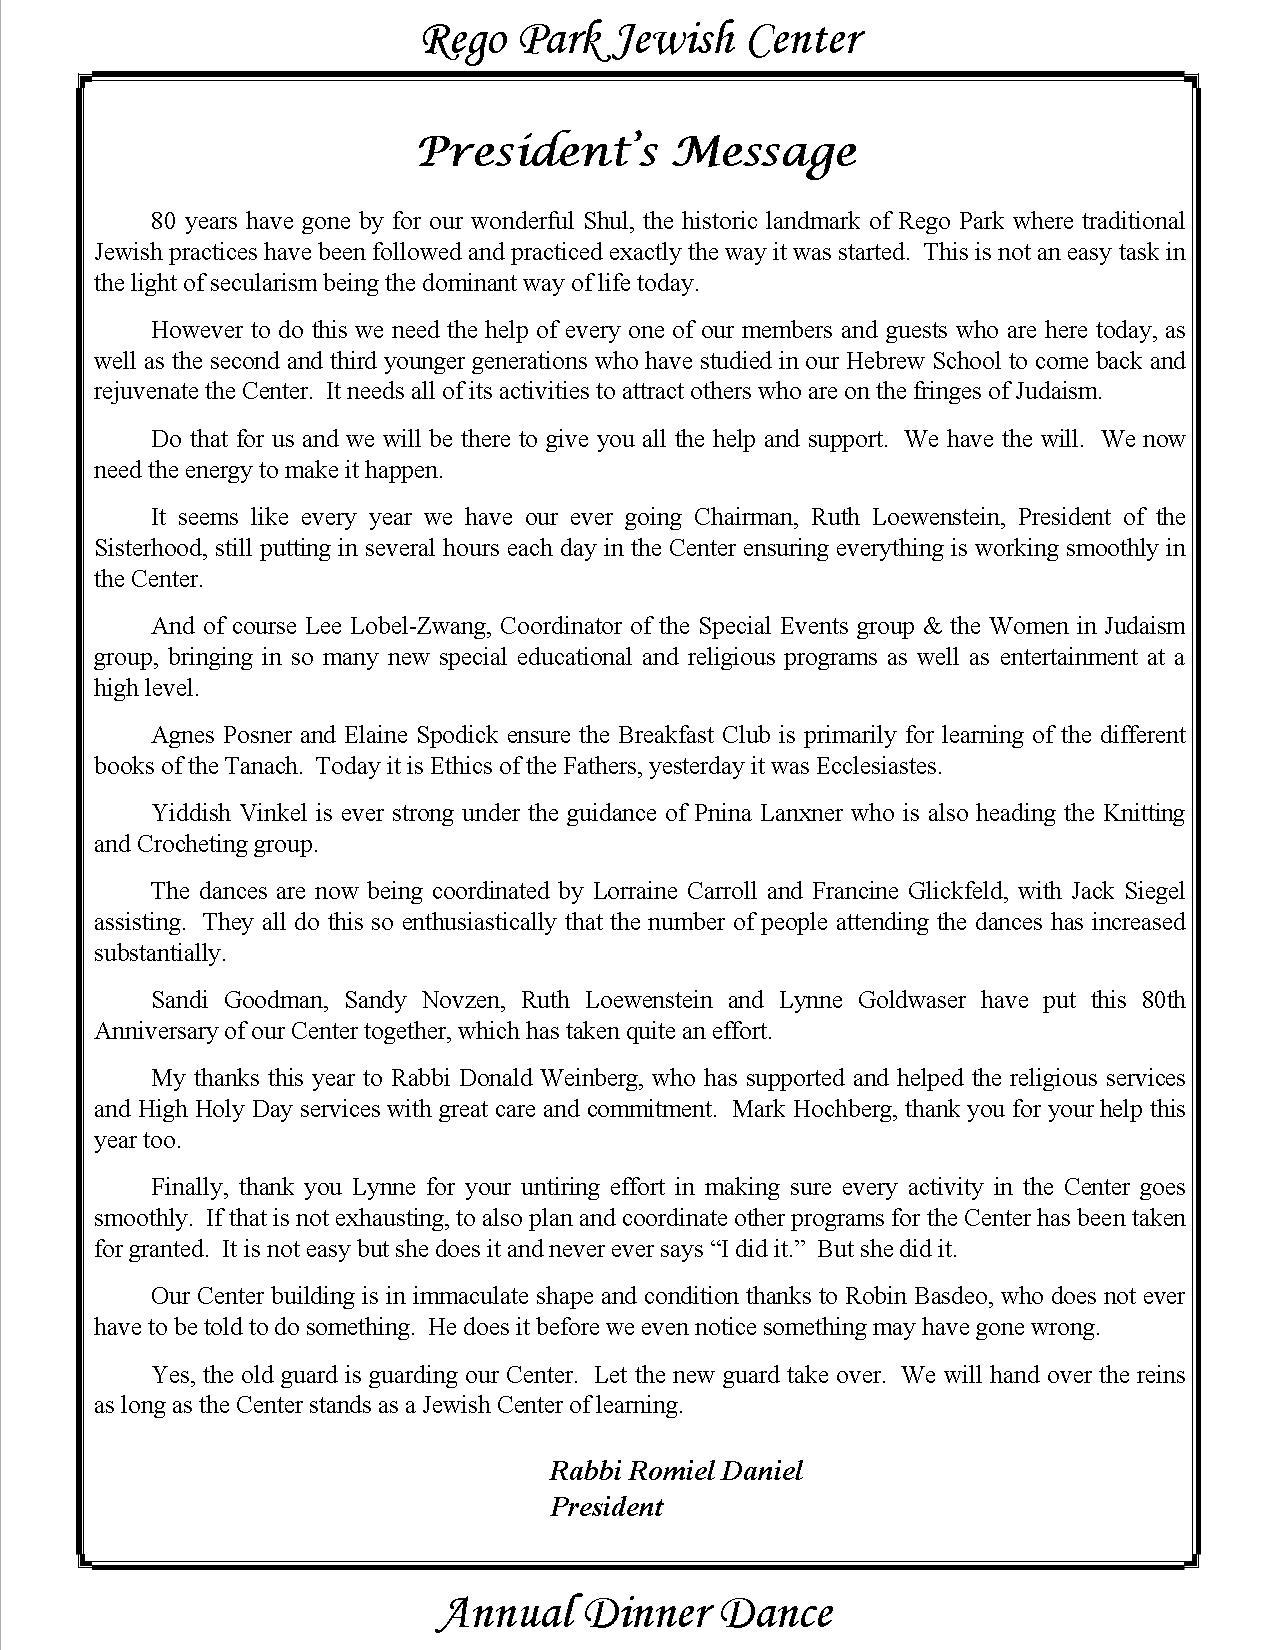 President Prelim page 5 - Copy.jpg